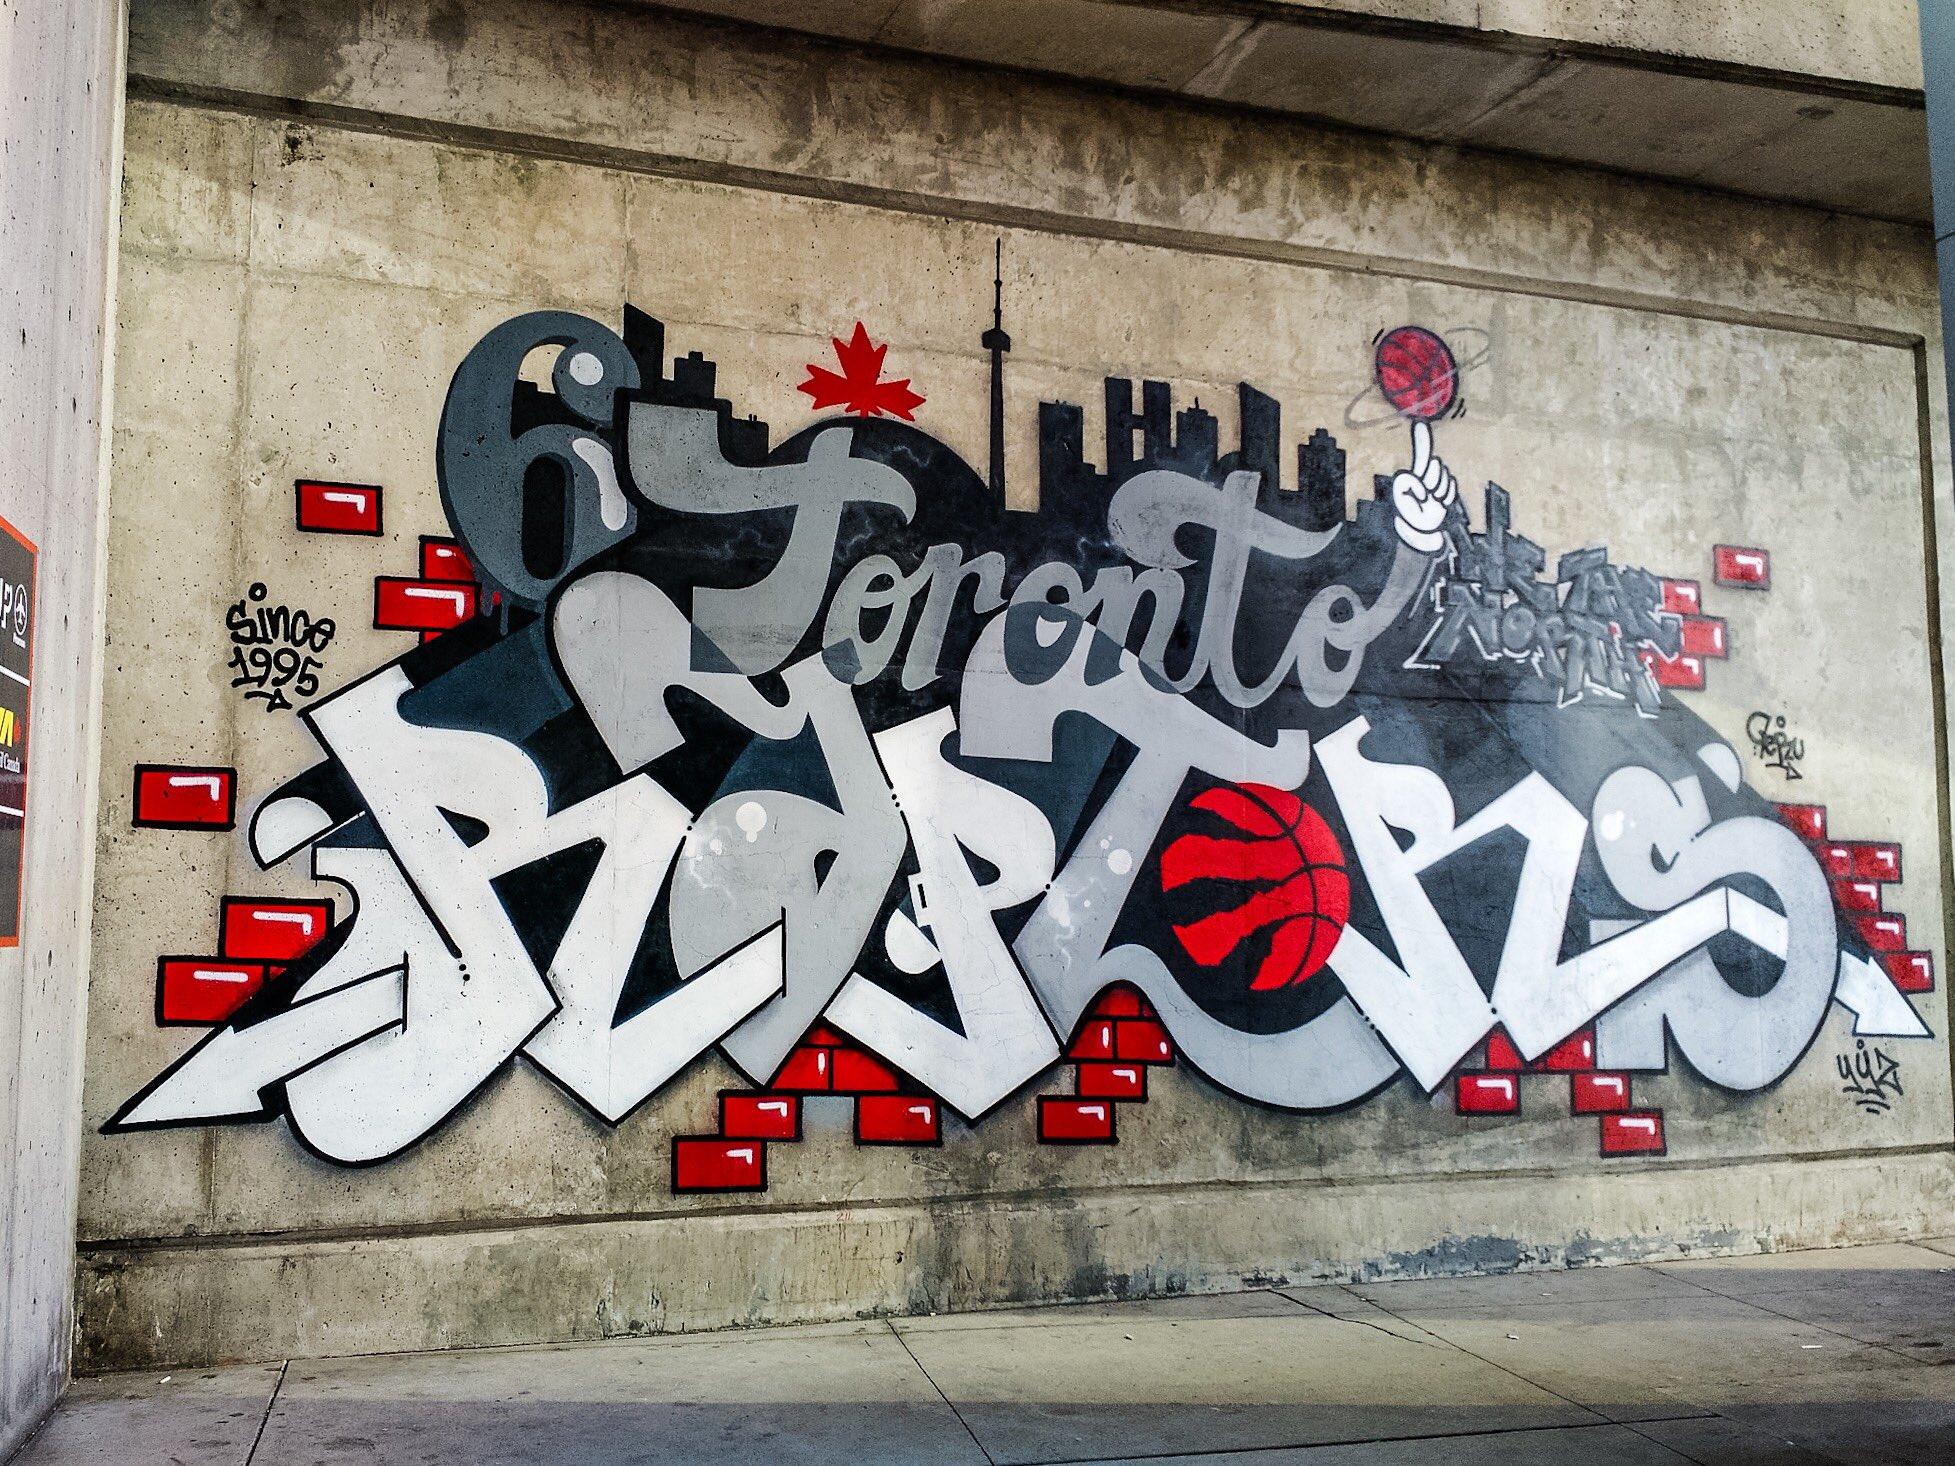 street art now on twitter